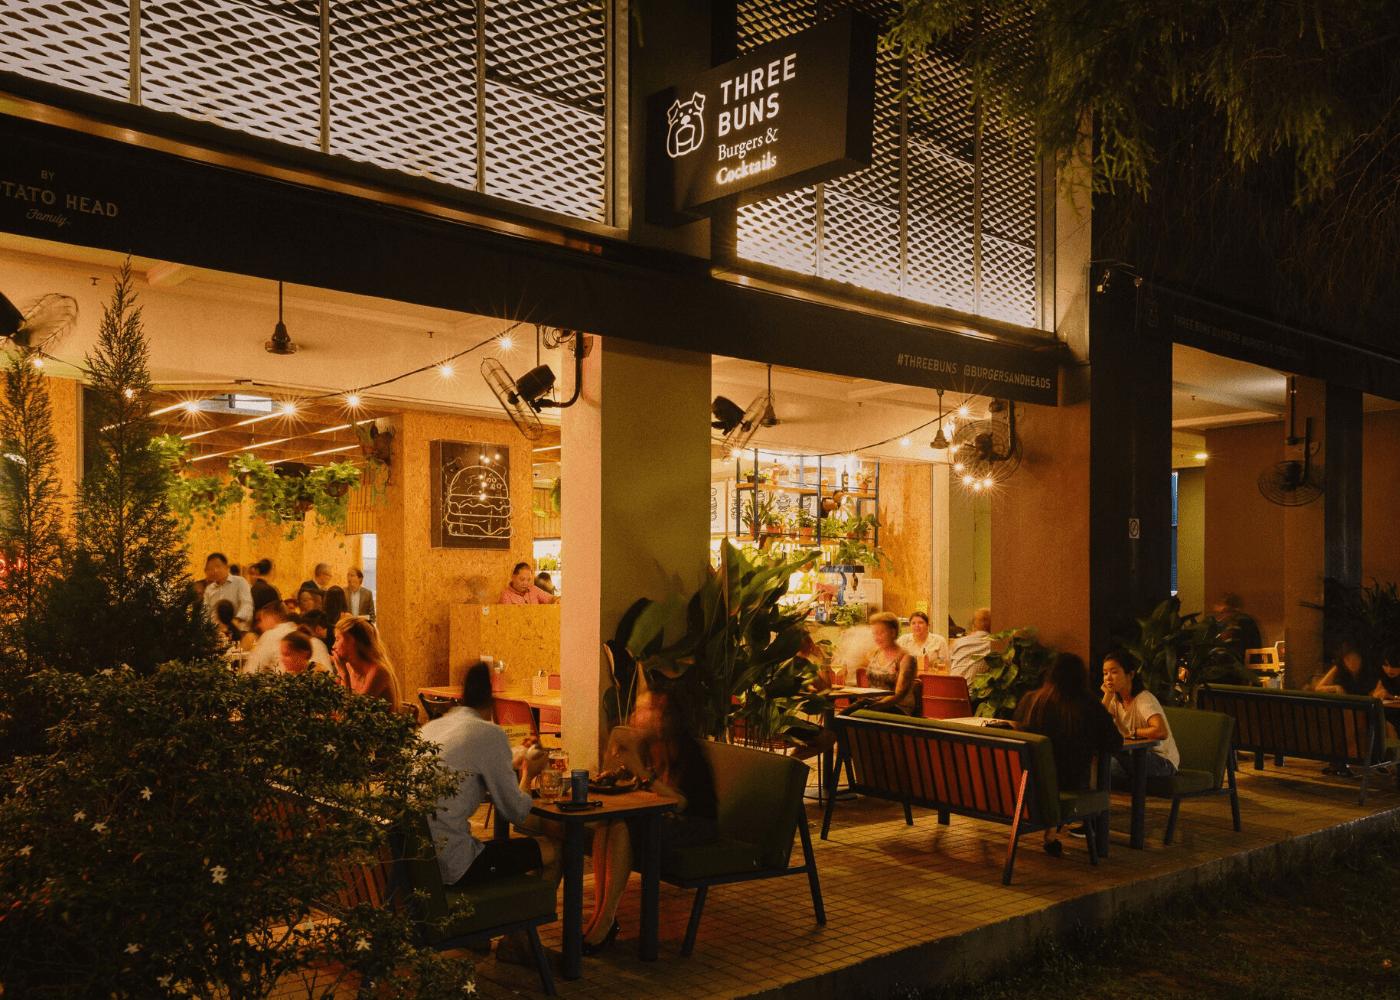 three buns quayside | new restaurants in singapore